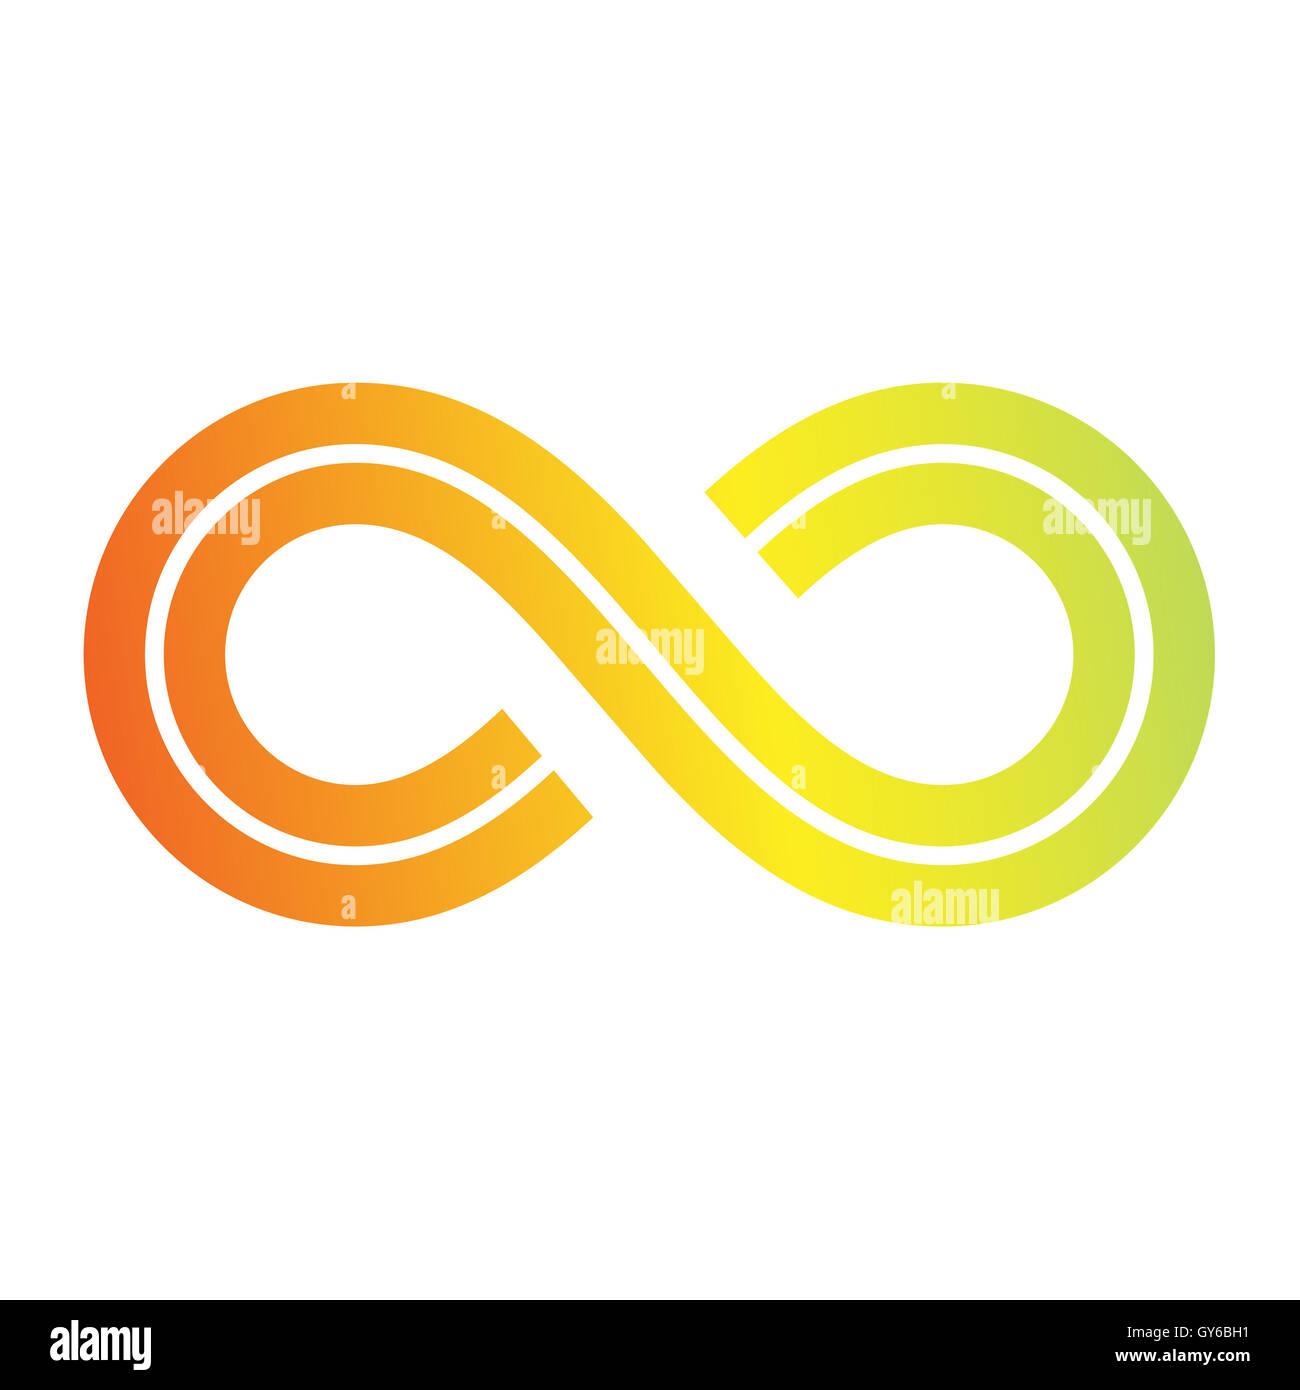 Infinity Infinite Symbol Stockfotos & Infinity Infinite Symbol ...